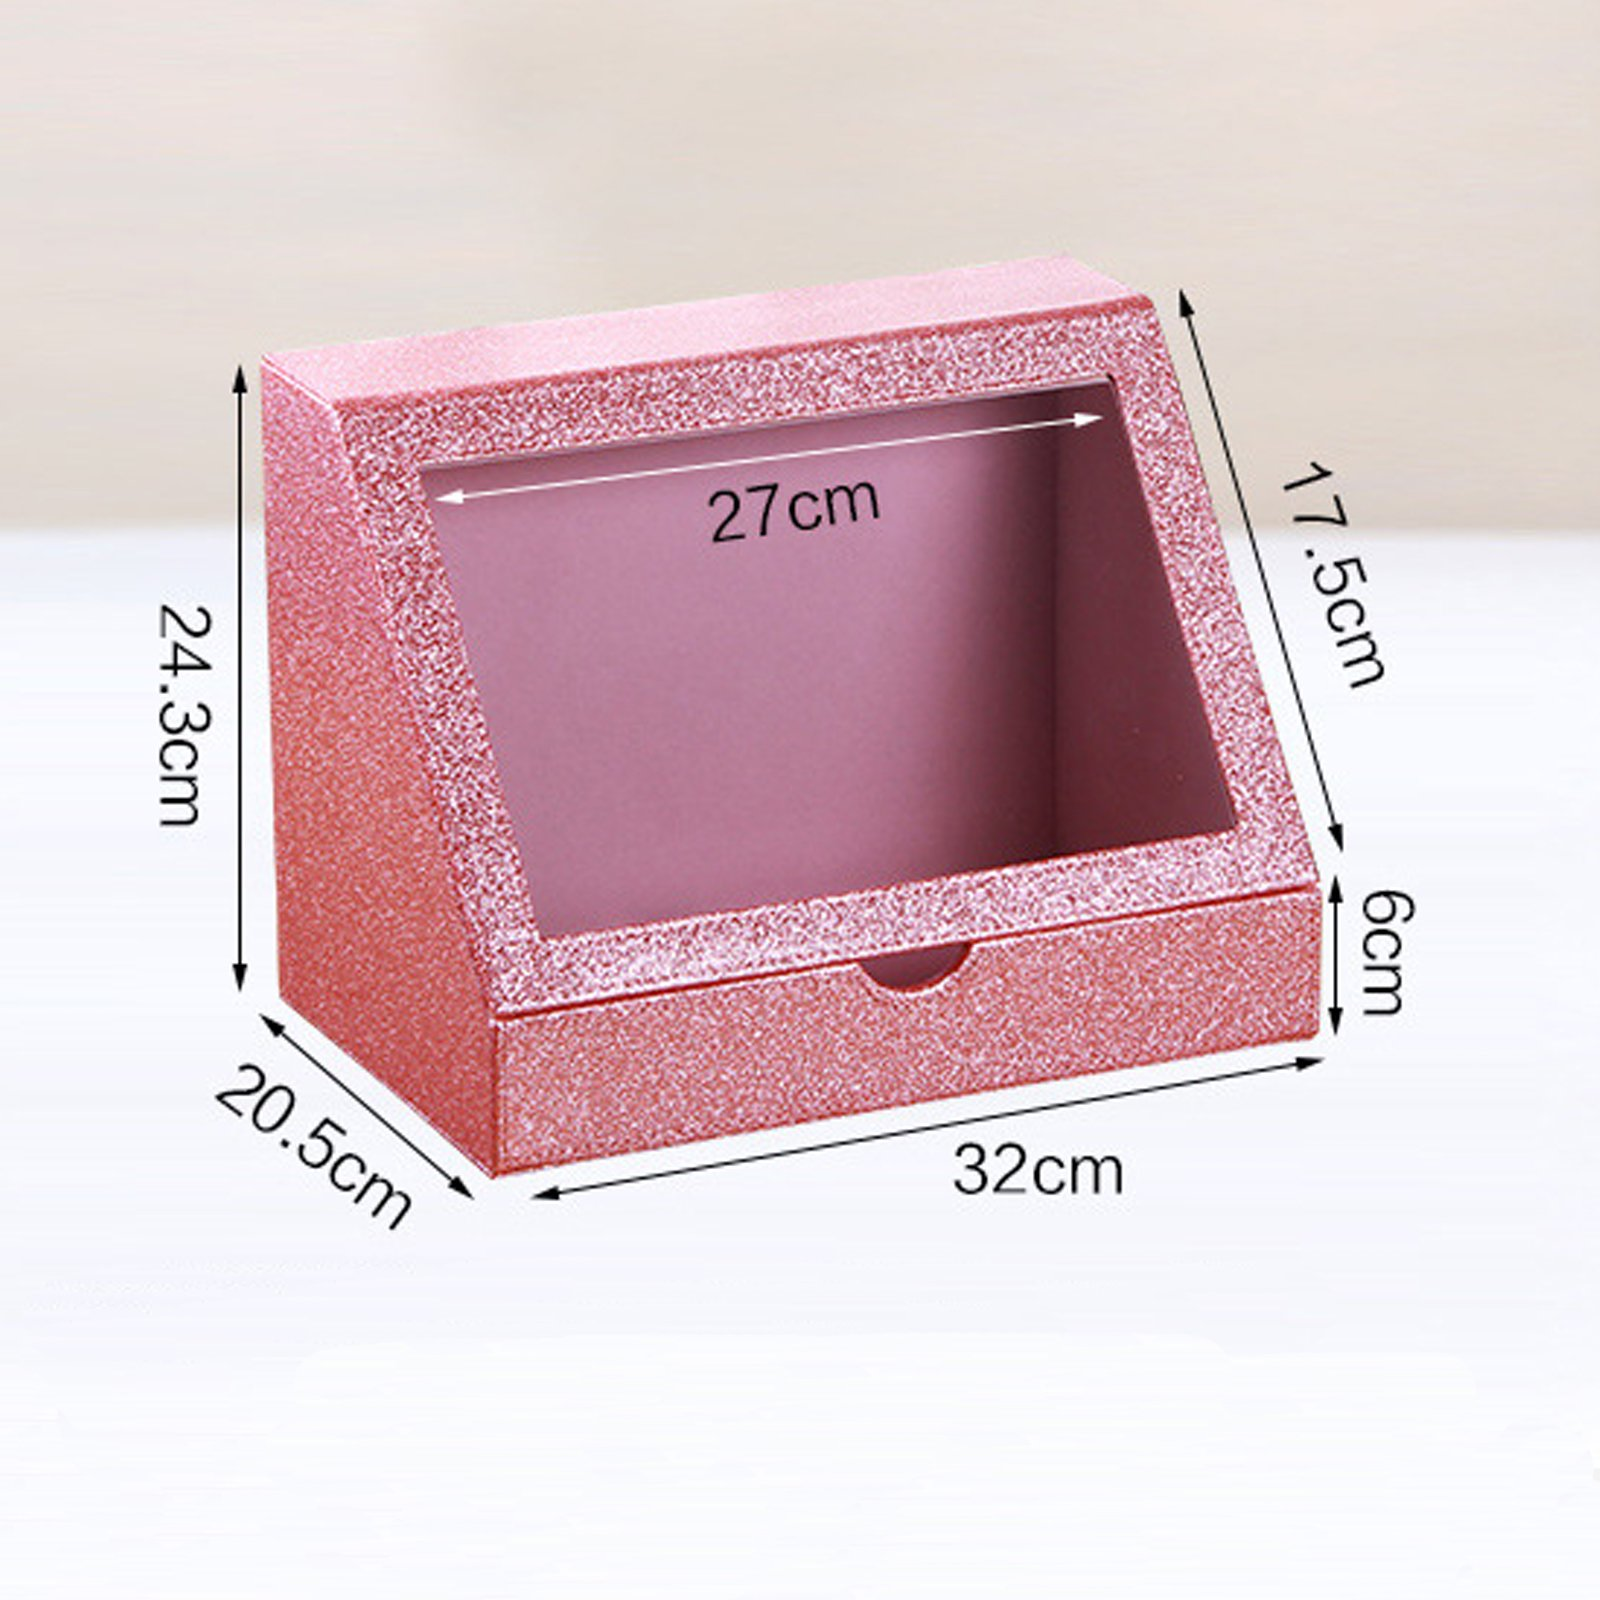 Arolly Glitter Makeup Organizer for Women/ Girls, Cosmetic Storage Case / Box [Pink] COS-GLT-01-PK / COS-GLT-01/02-PK